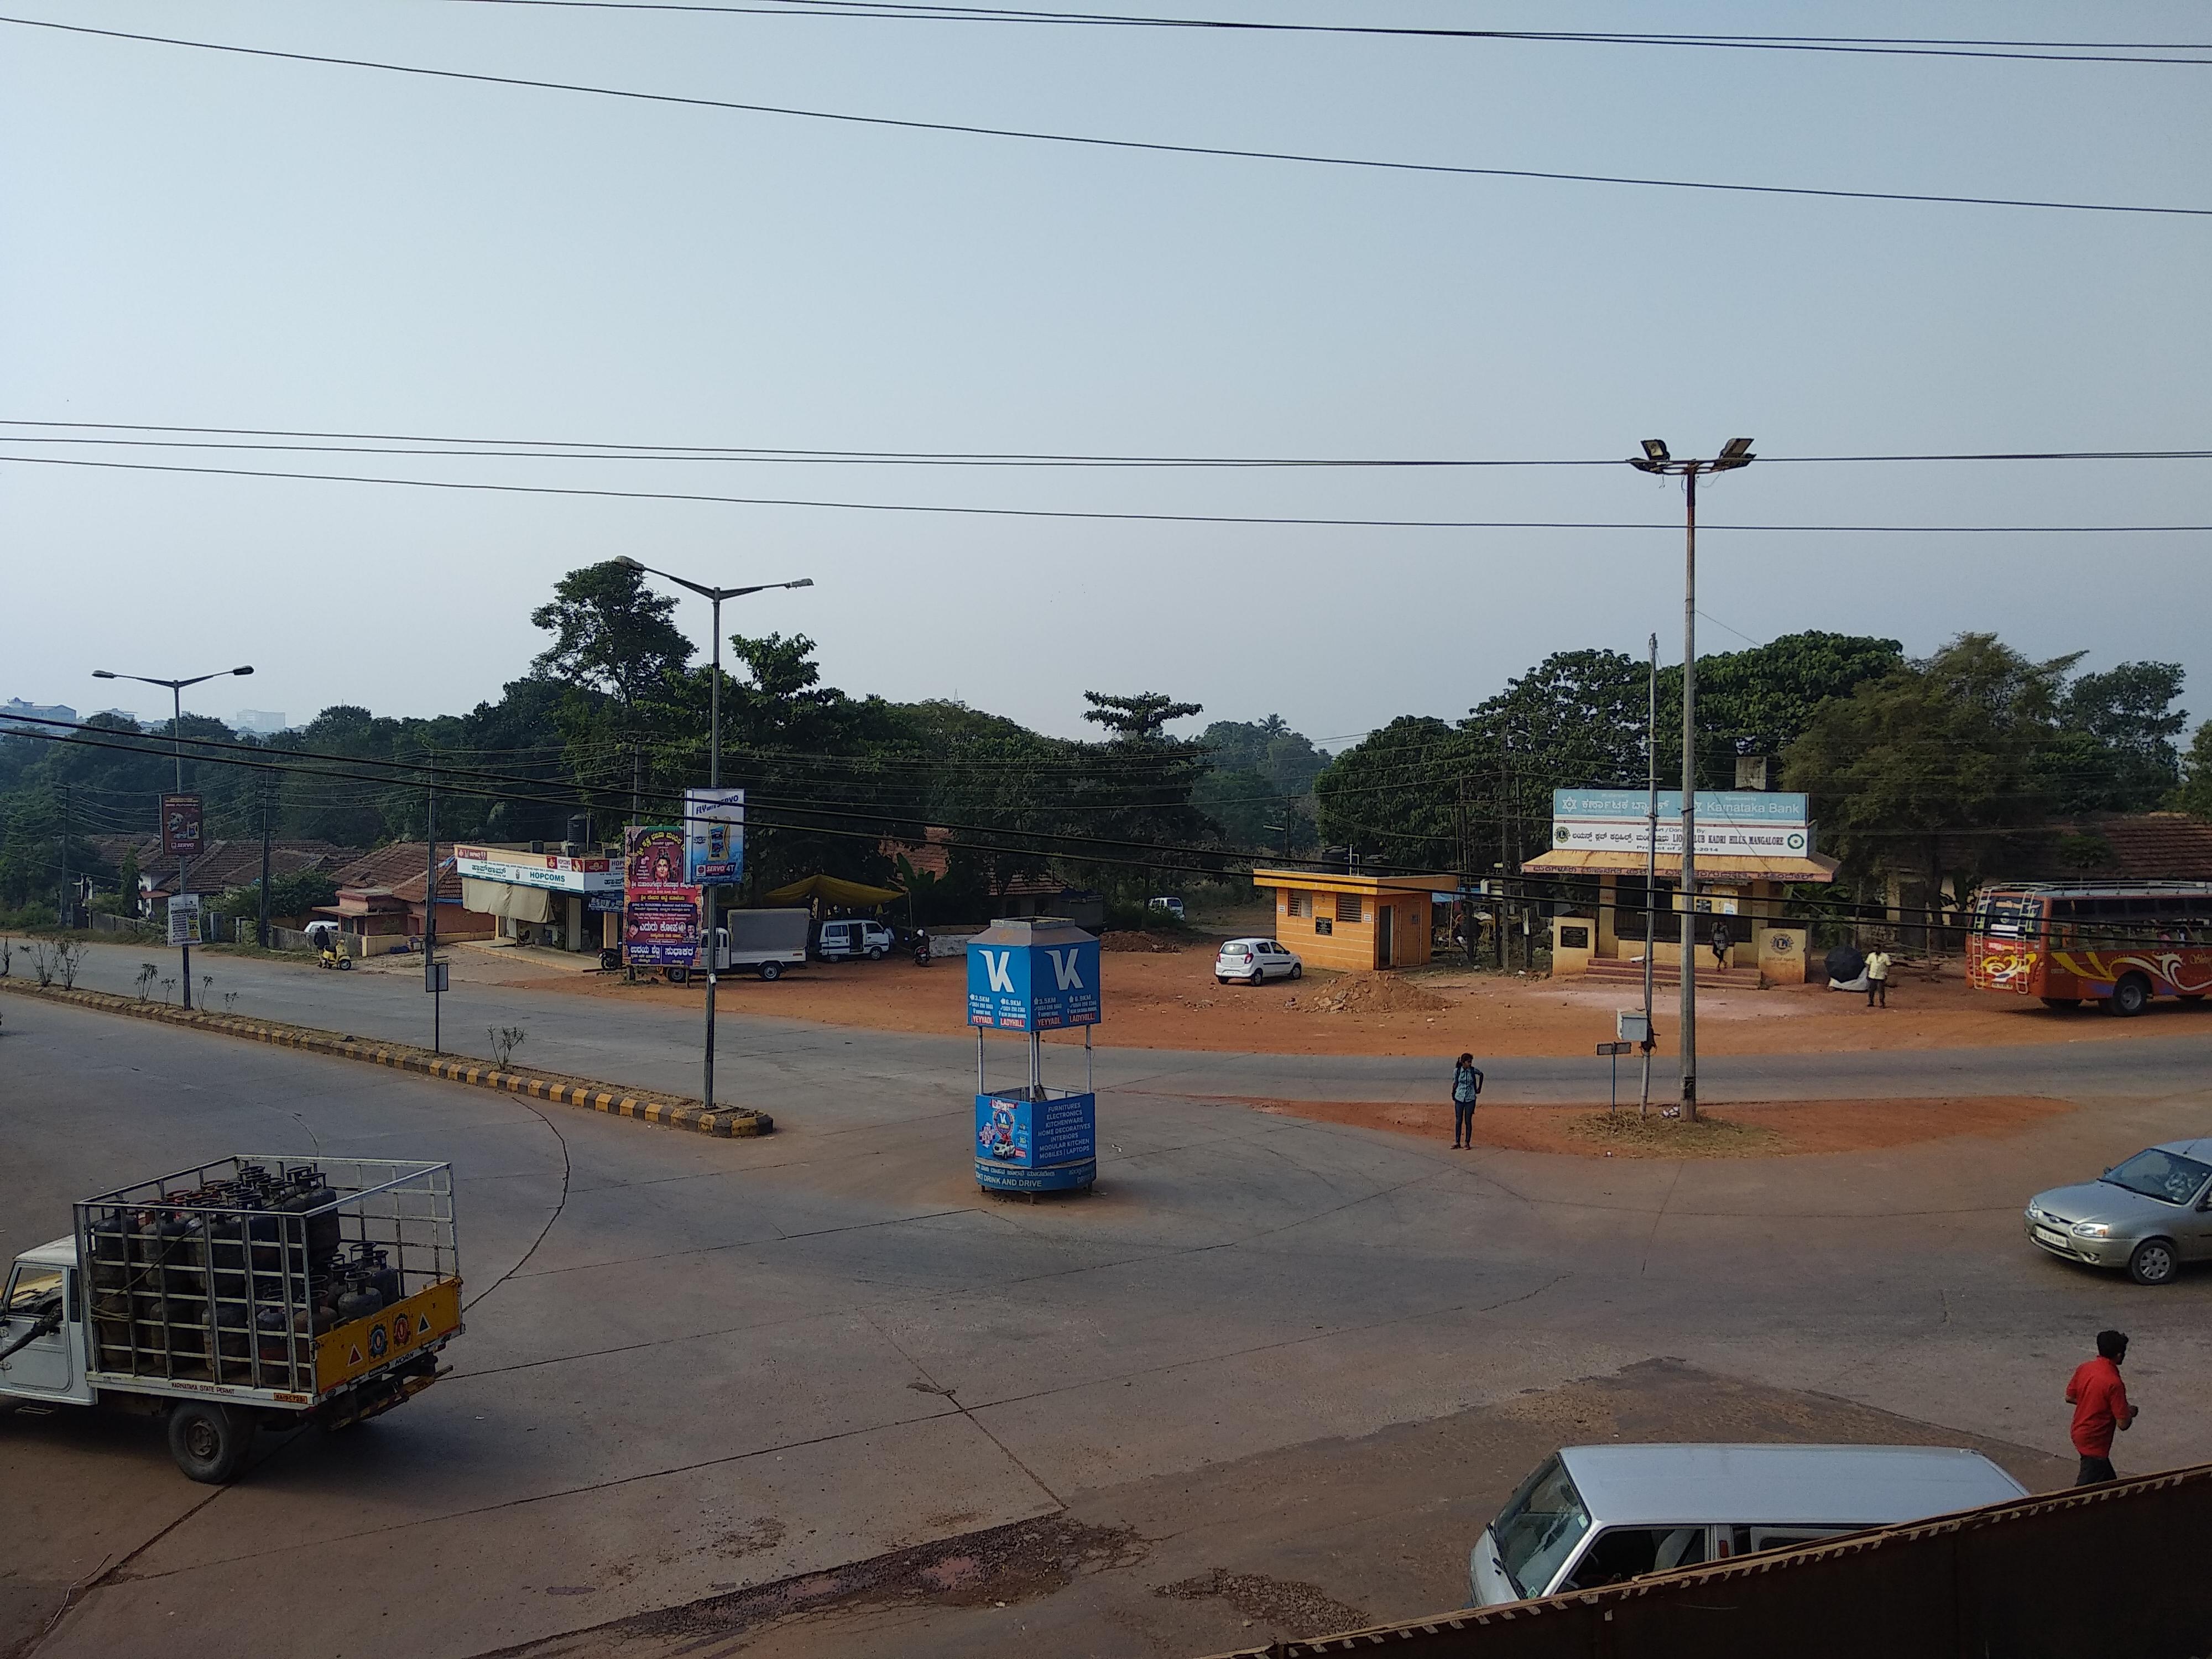 File:Bondel Junction, Mangalore,Karnataka, India.jpg - Wikimedia Commons